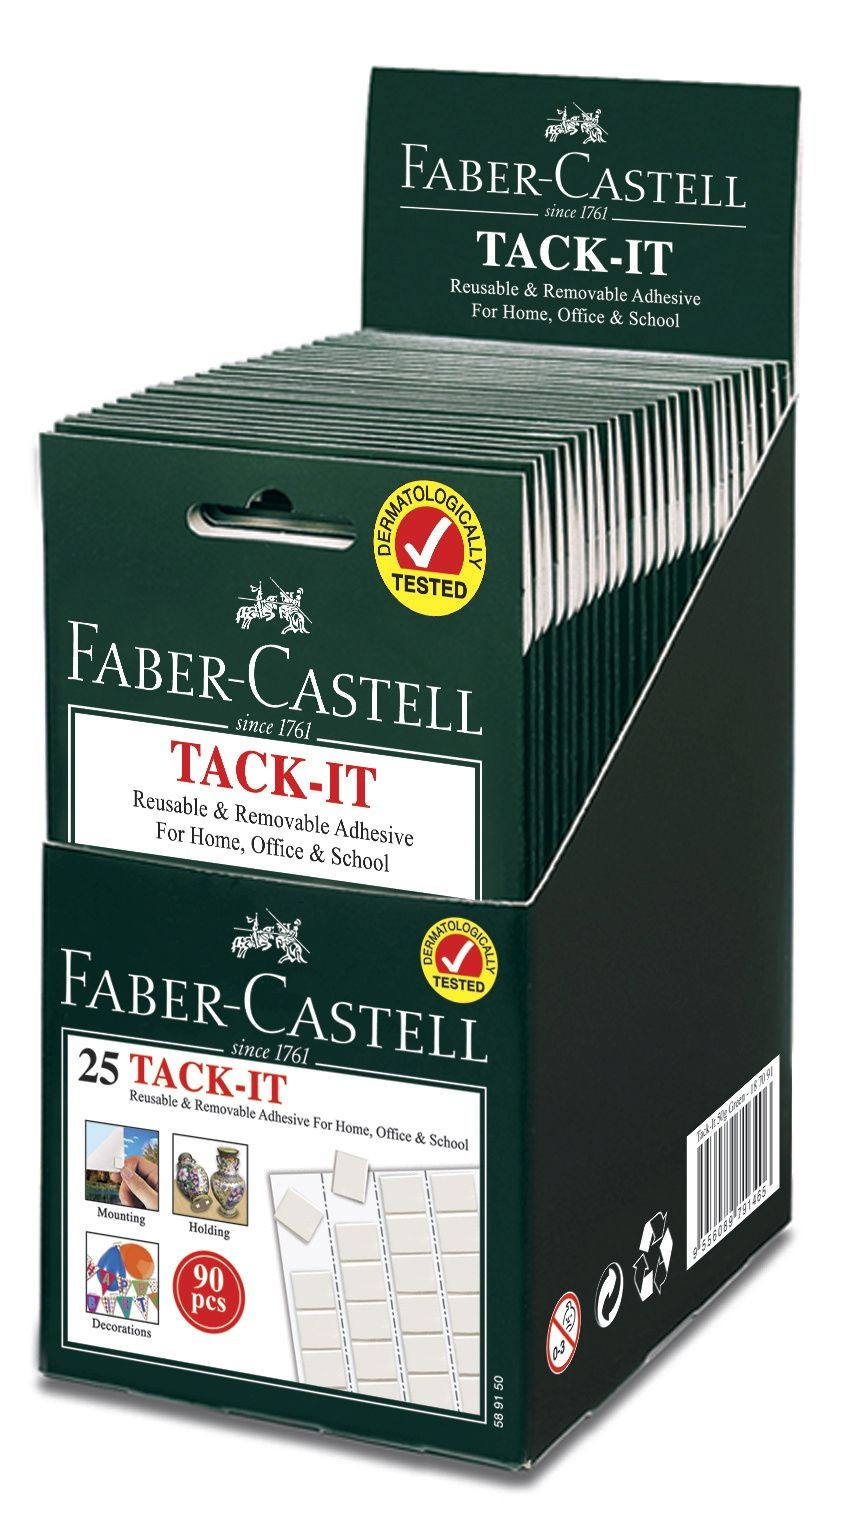 GUMA ADEZIVA 50G TACK-IT FABER-CASTELL